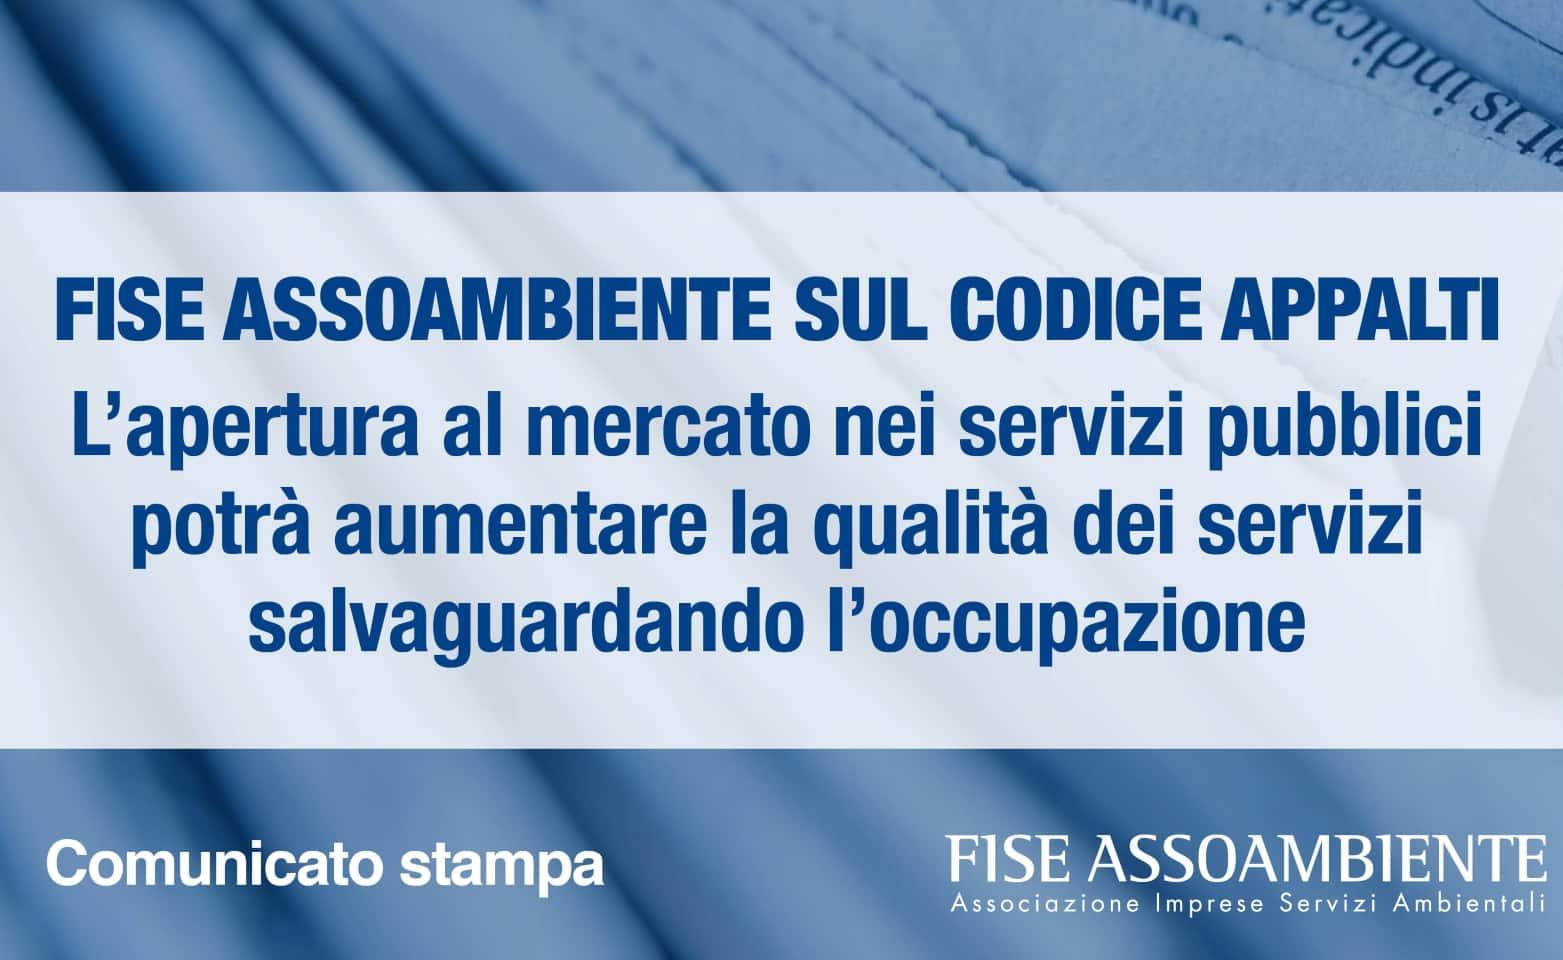 FISE Assoambiente - Codice Appalti